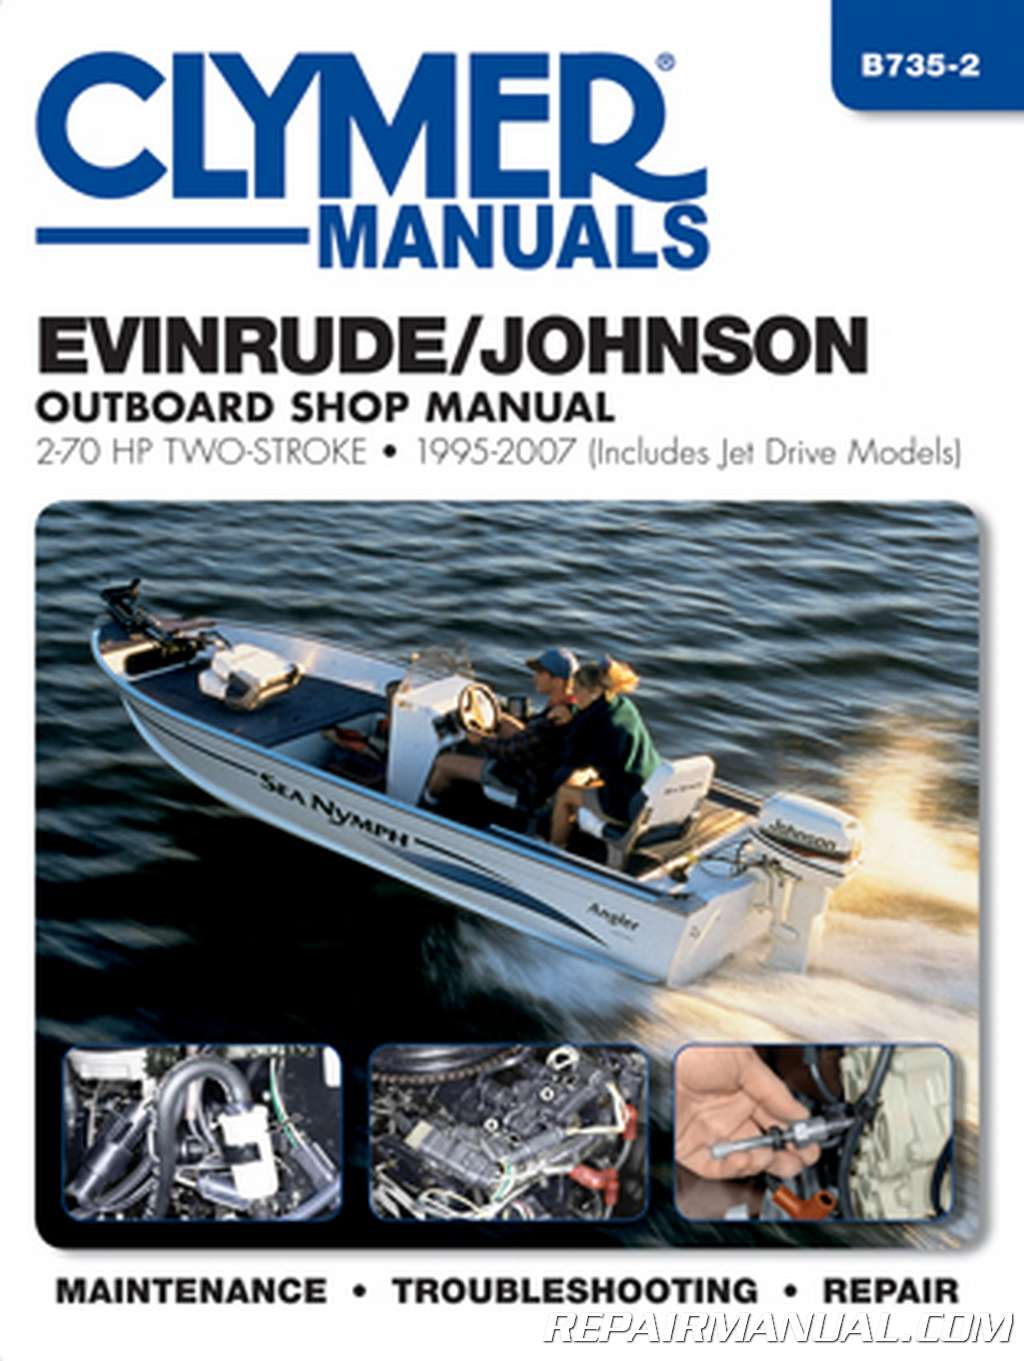 evinrudejohnson outboard shop manual   hp  stroke includes jet drives  clymer